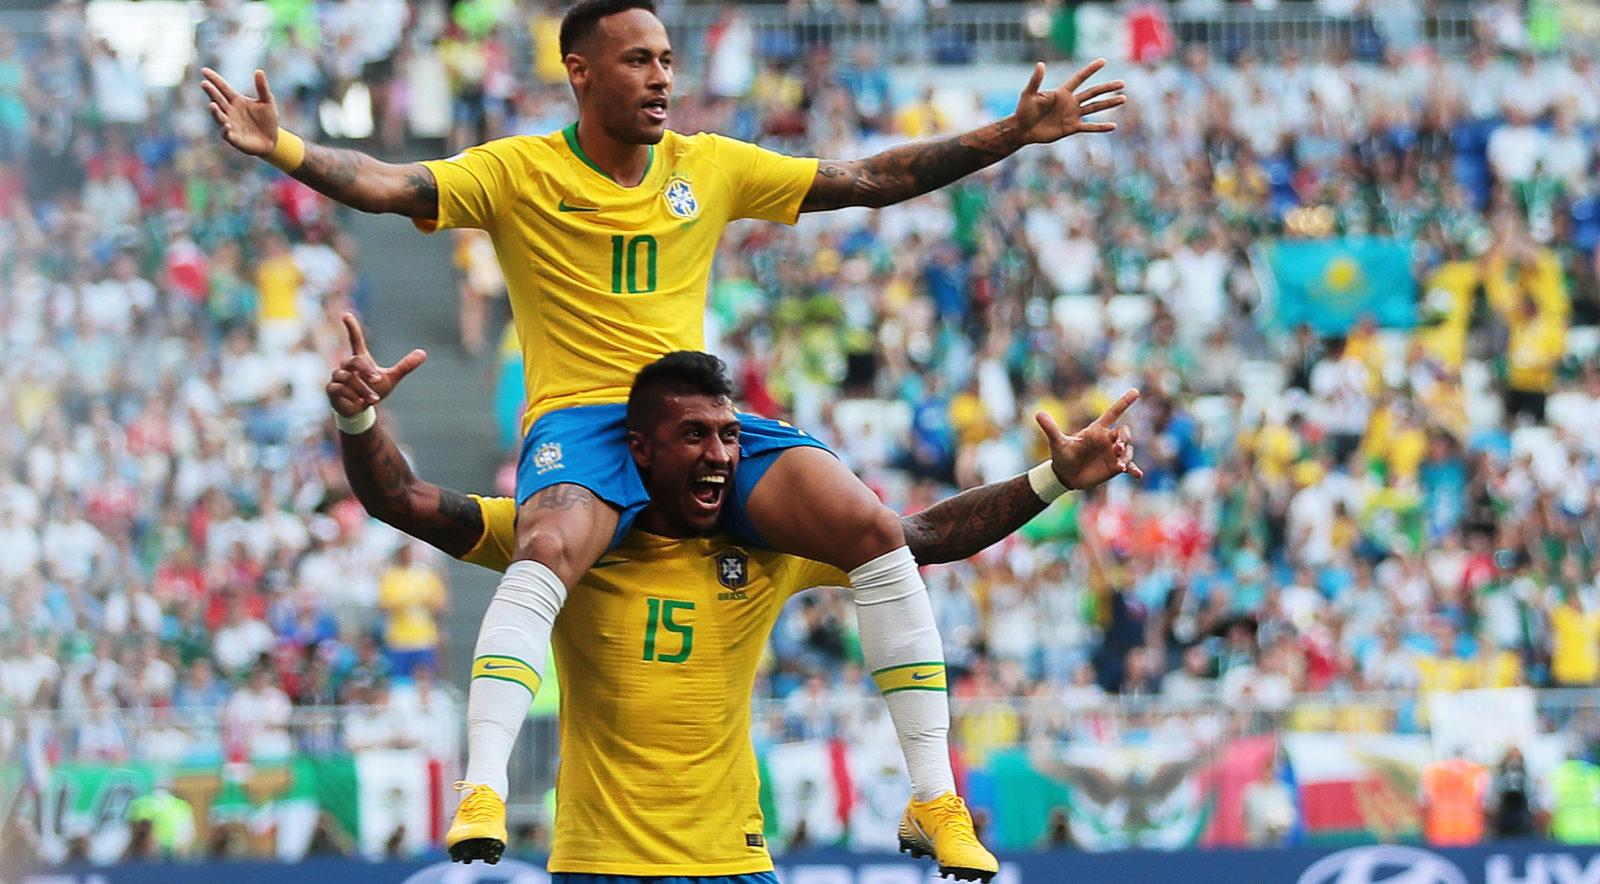 59893df899e Brazil vs Belgium  Head-to-head record and World Cup history